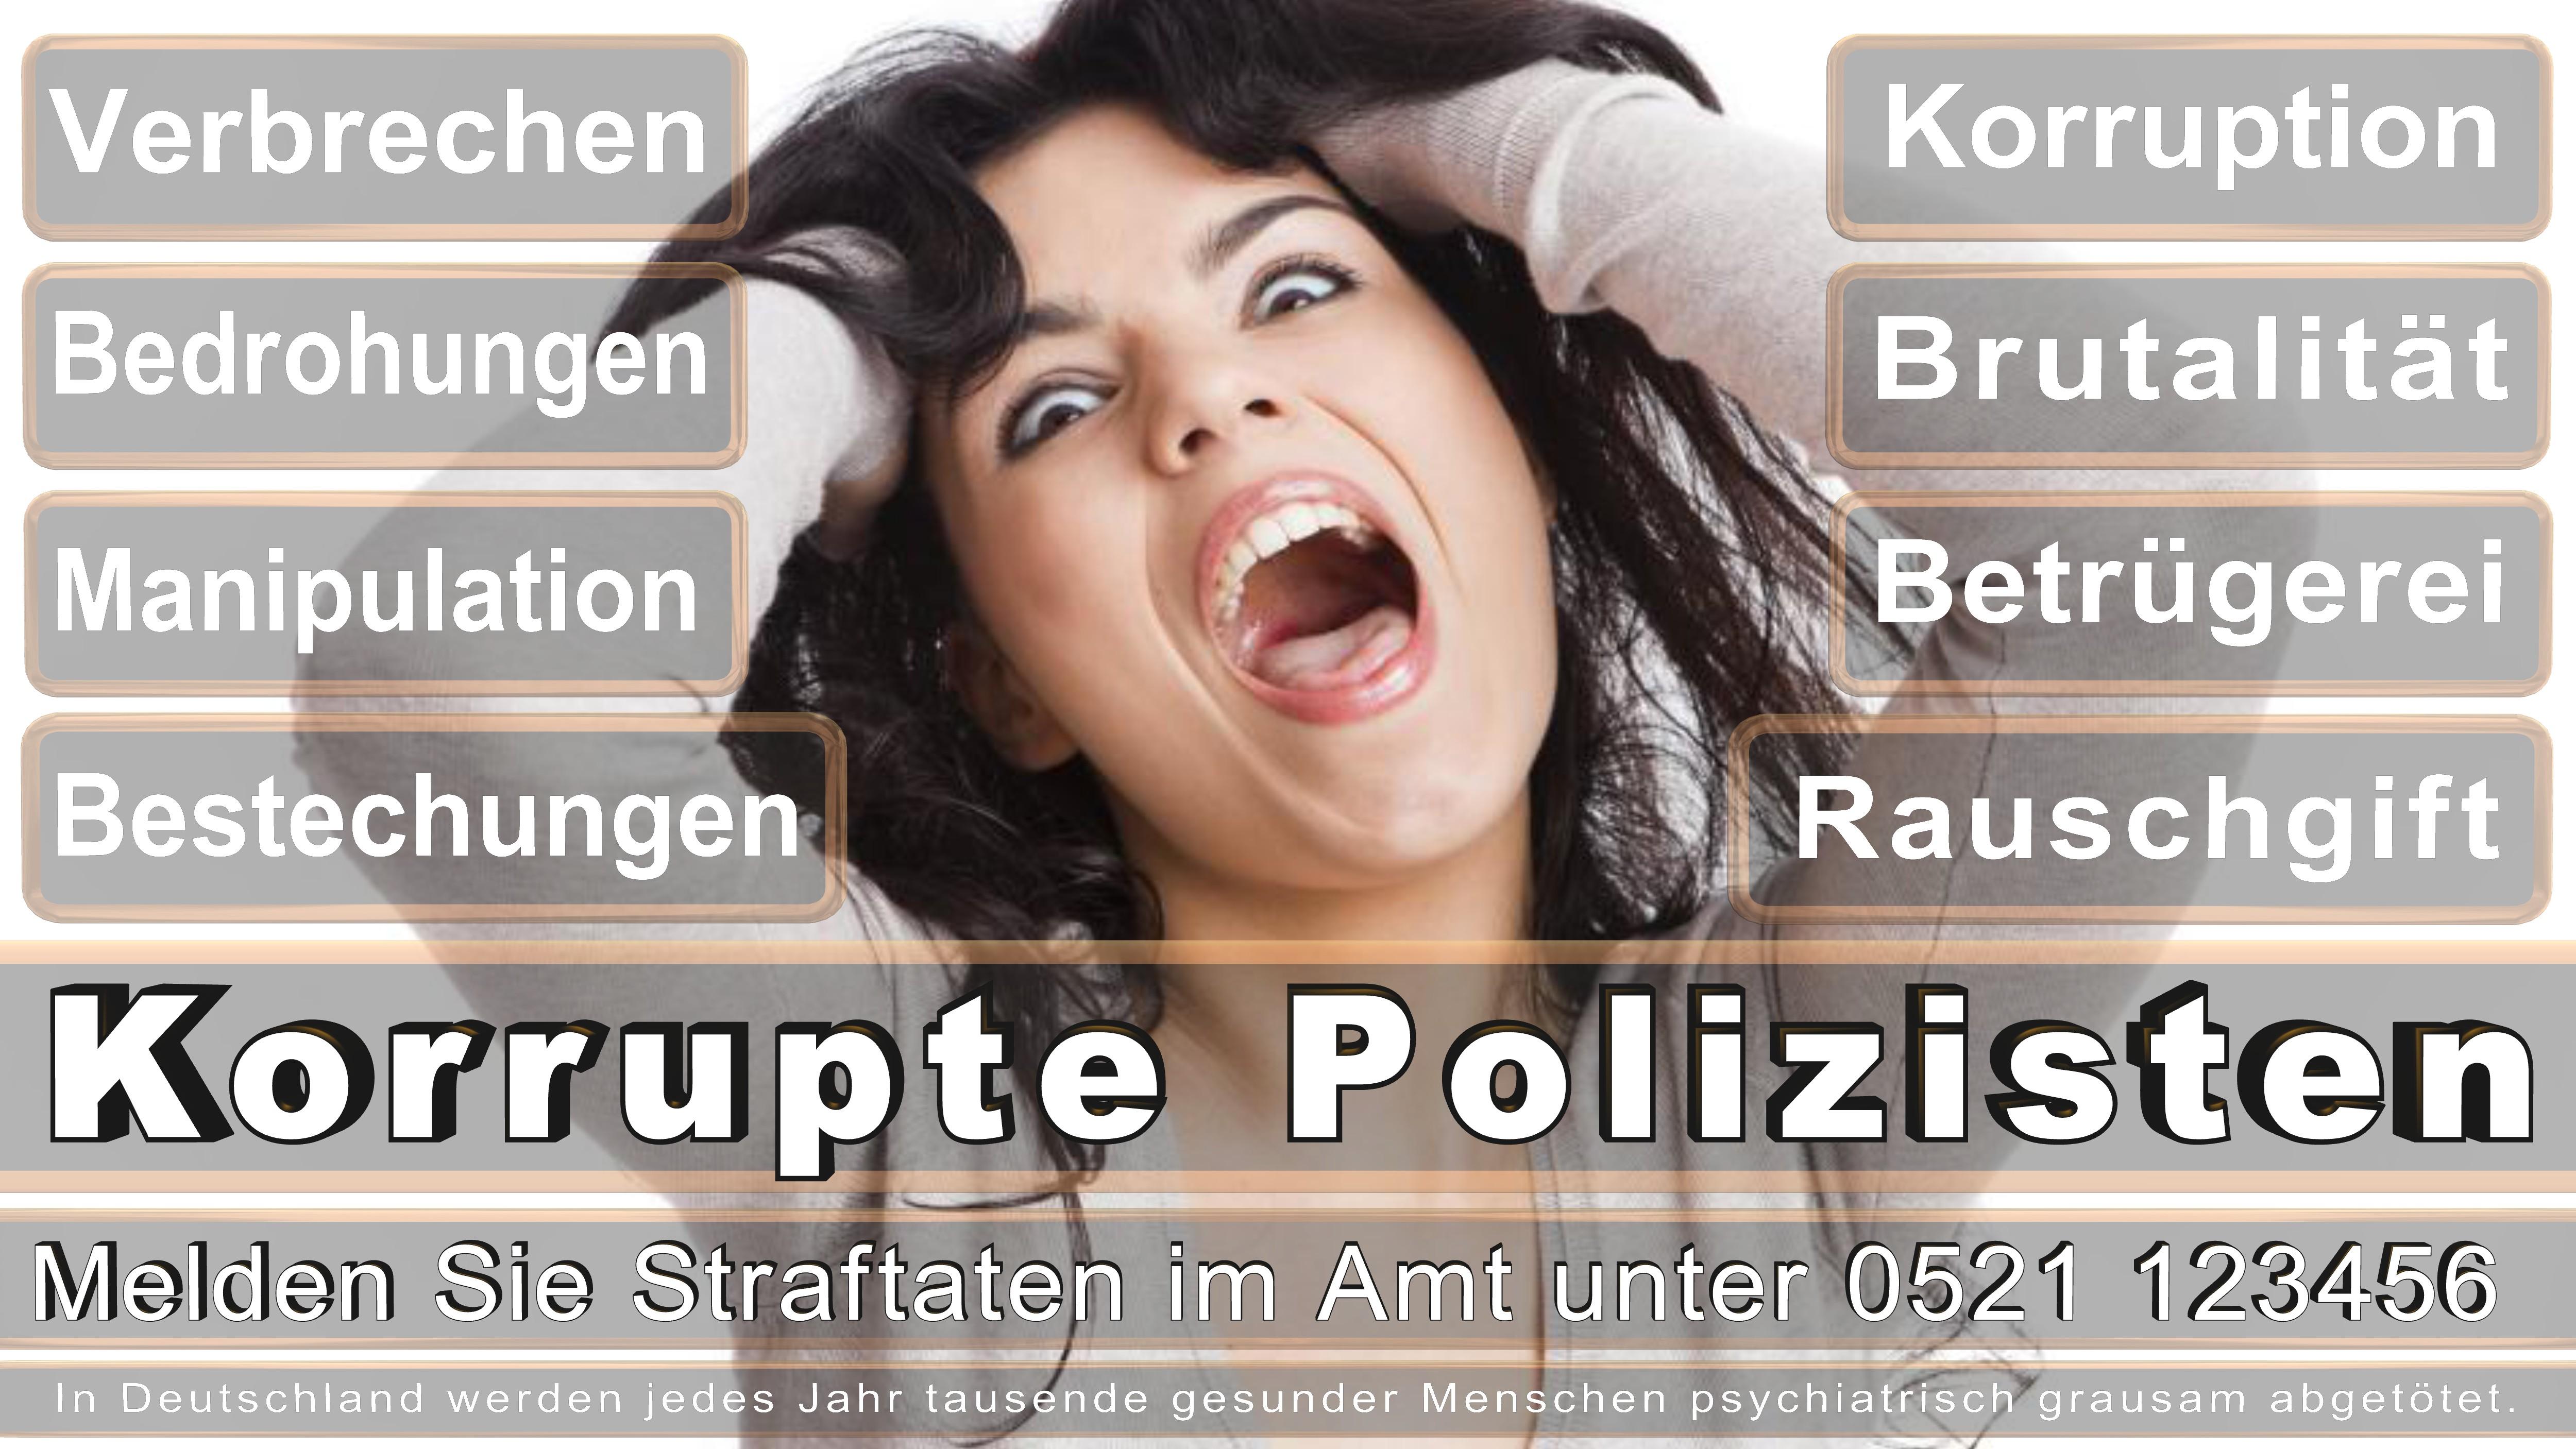 Polizei-Bielefeld-Polizei-Bielefeld-Polizei-Bielefeld (178)